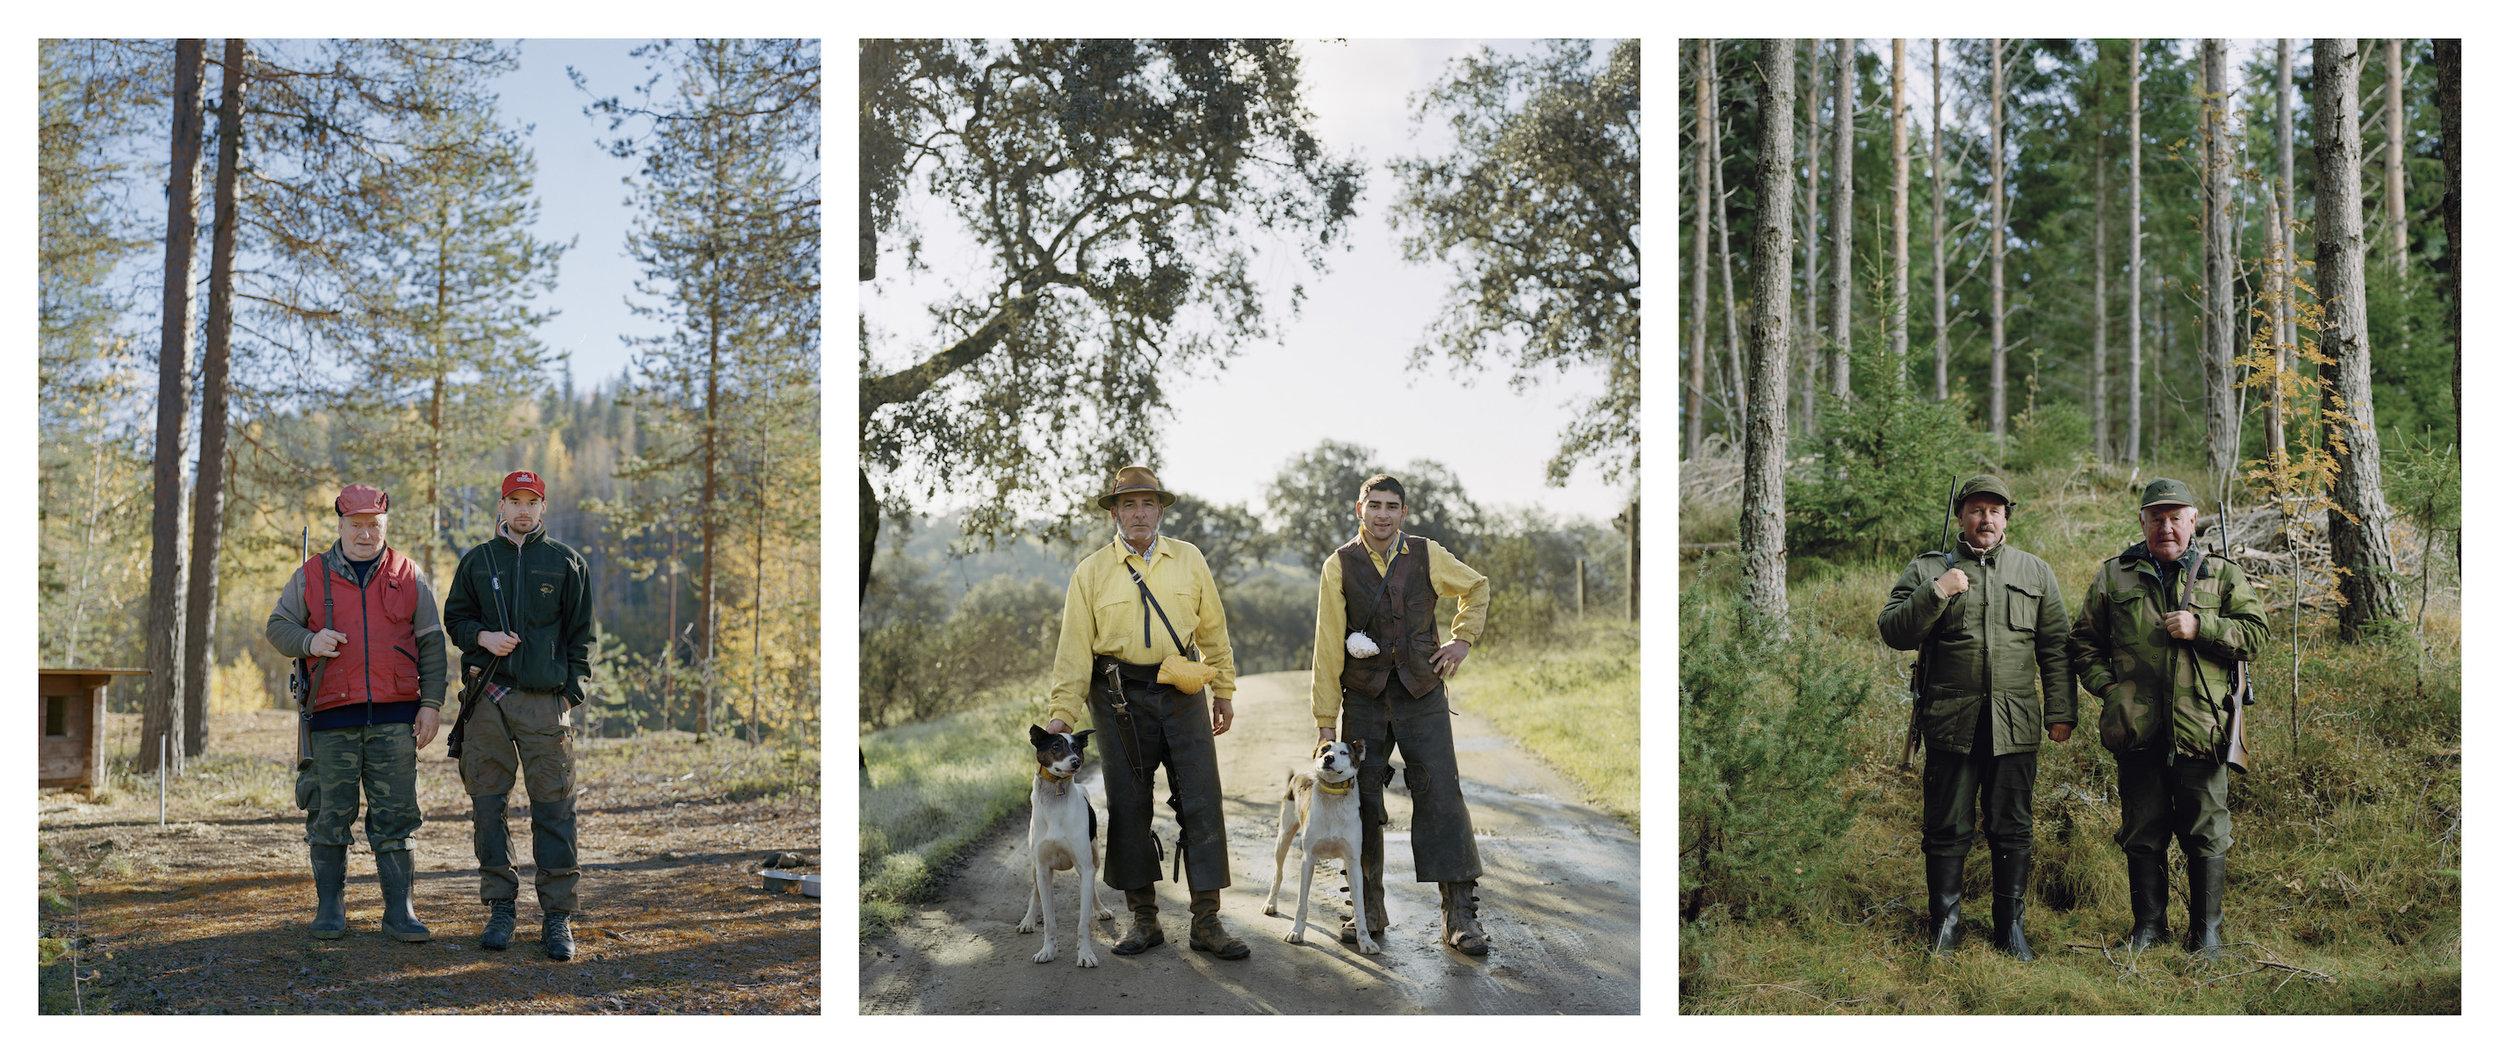 Bilder: Michael Tummings  Triptych  Halden VI (2009) / Cabalgaderos I (2011) / Pelo III (2010) 42 x 36 cm (each) Archival pigment print Unique (exhibition prints)